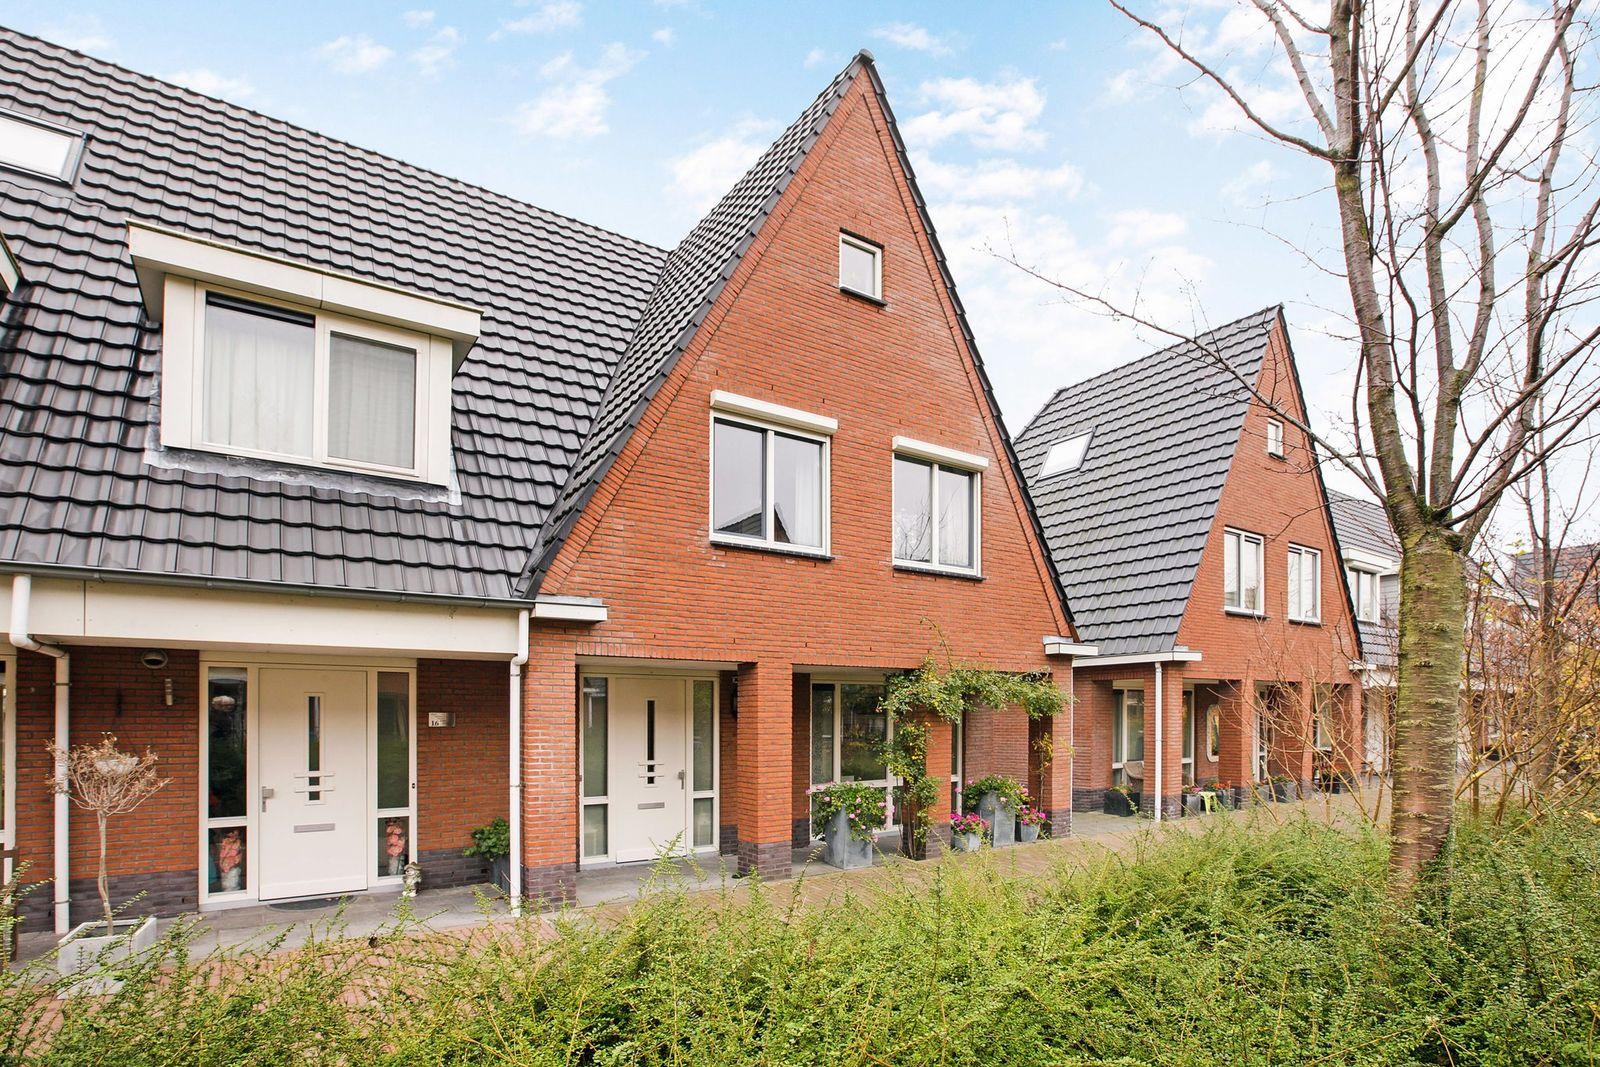 Zandoogjestraat 14, Aalsmeer